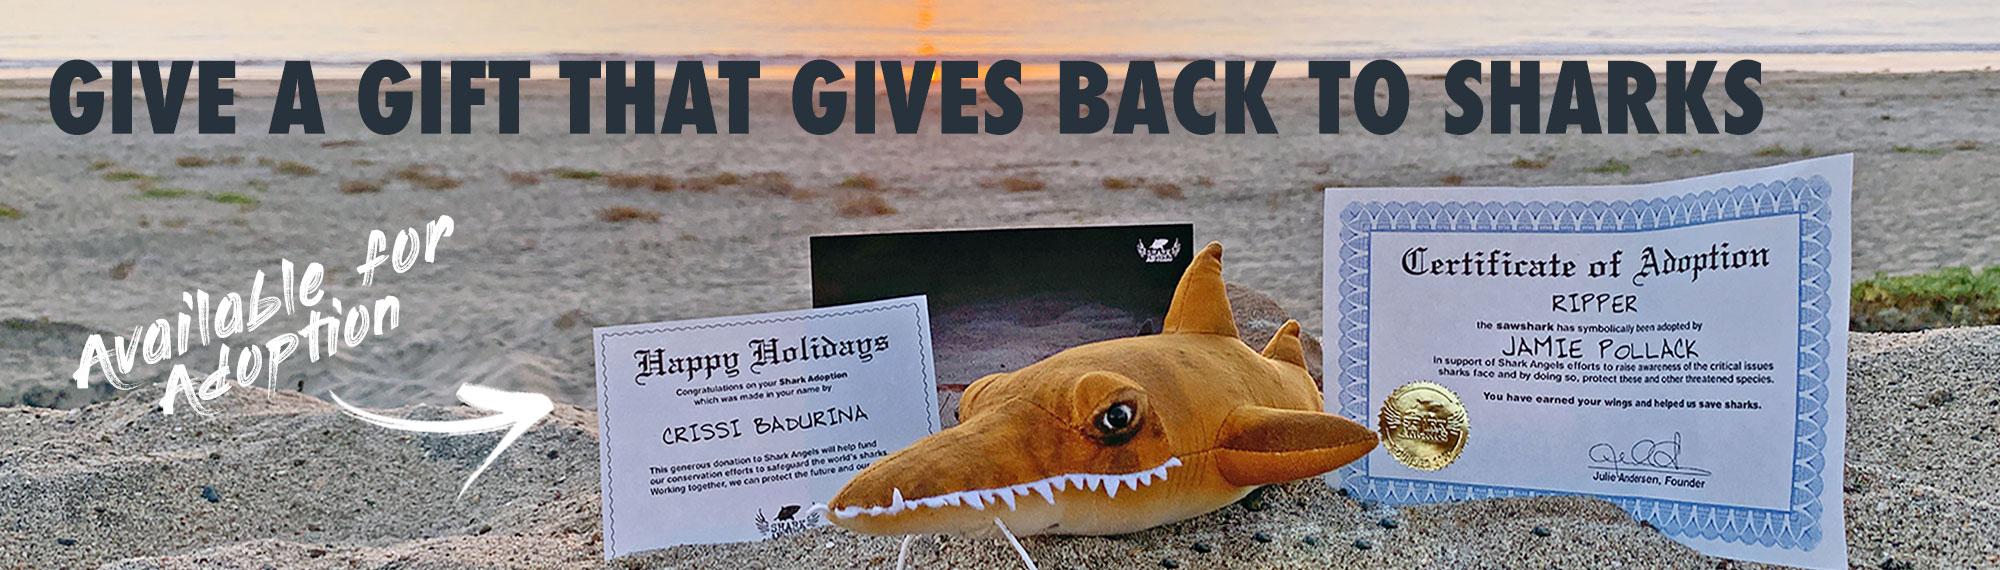 shark-adopt-category.jpg